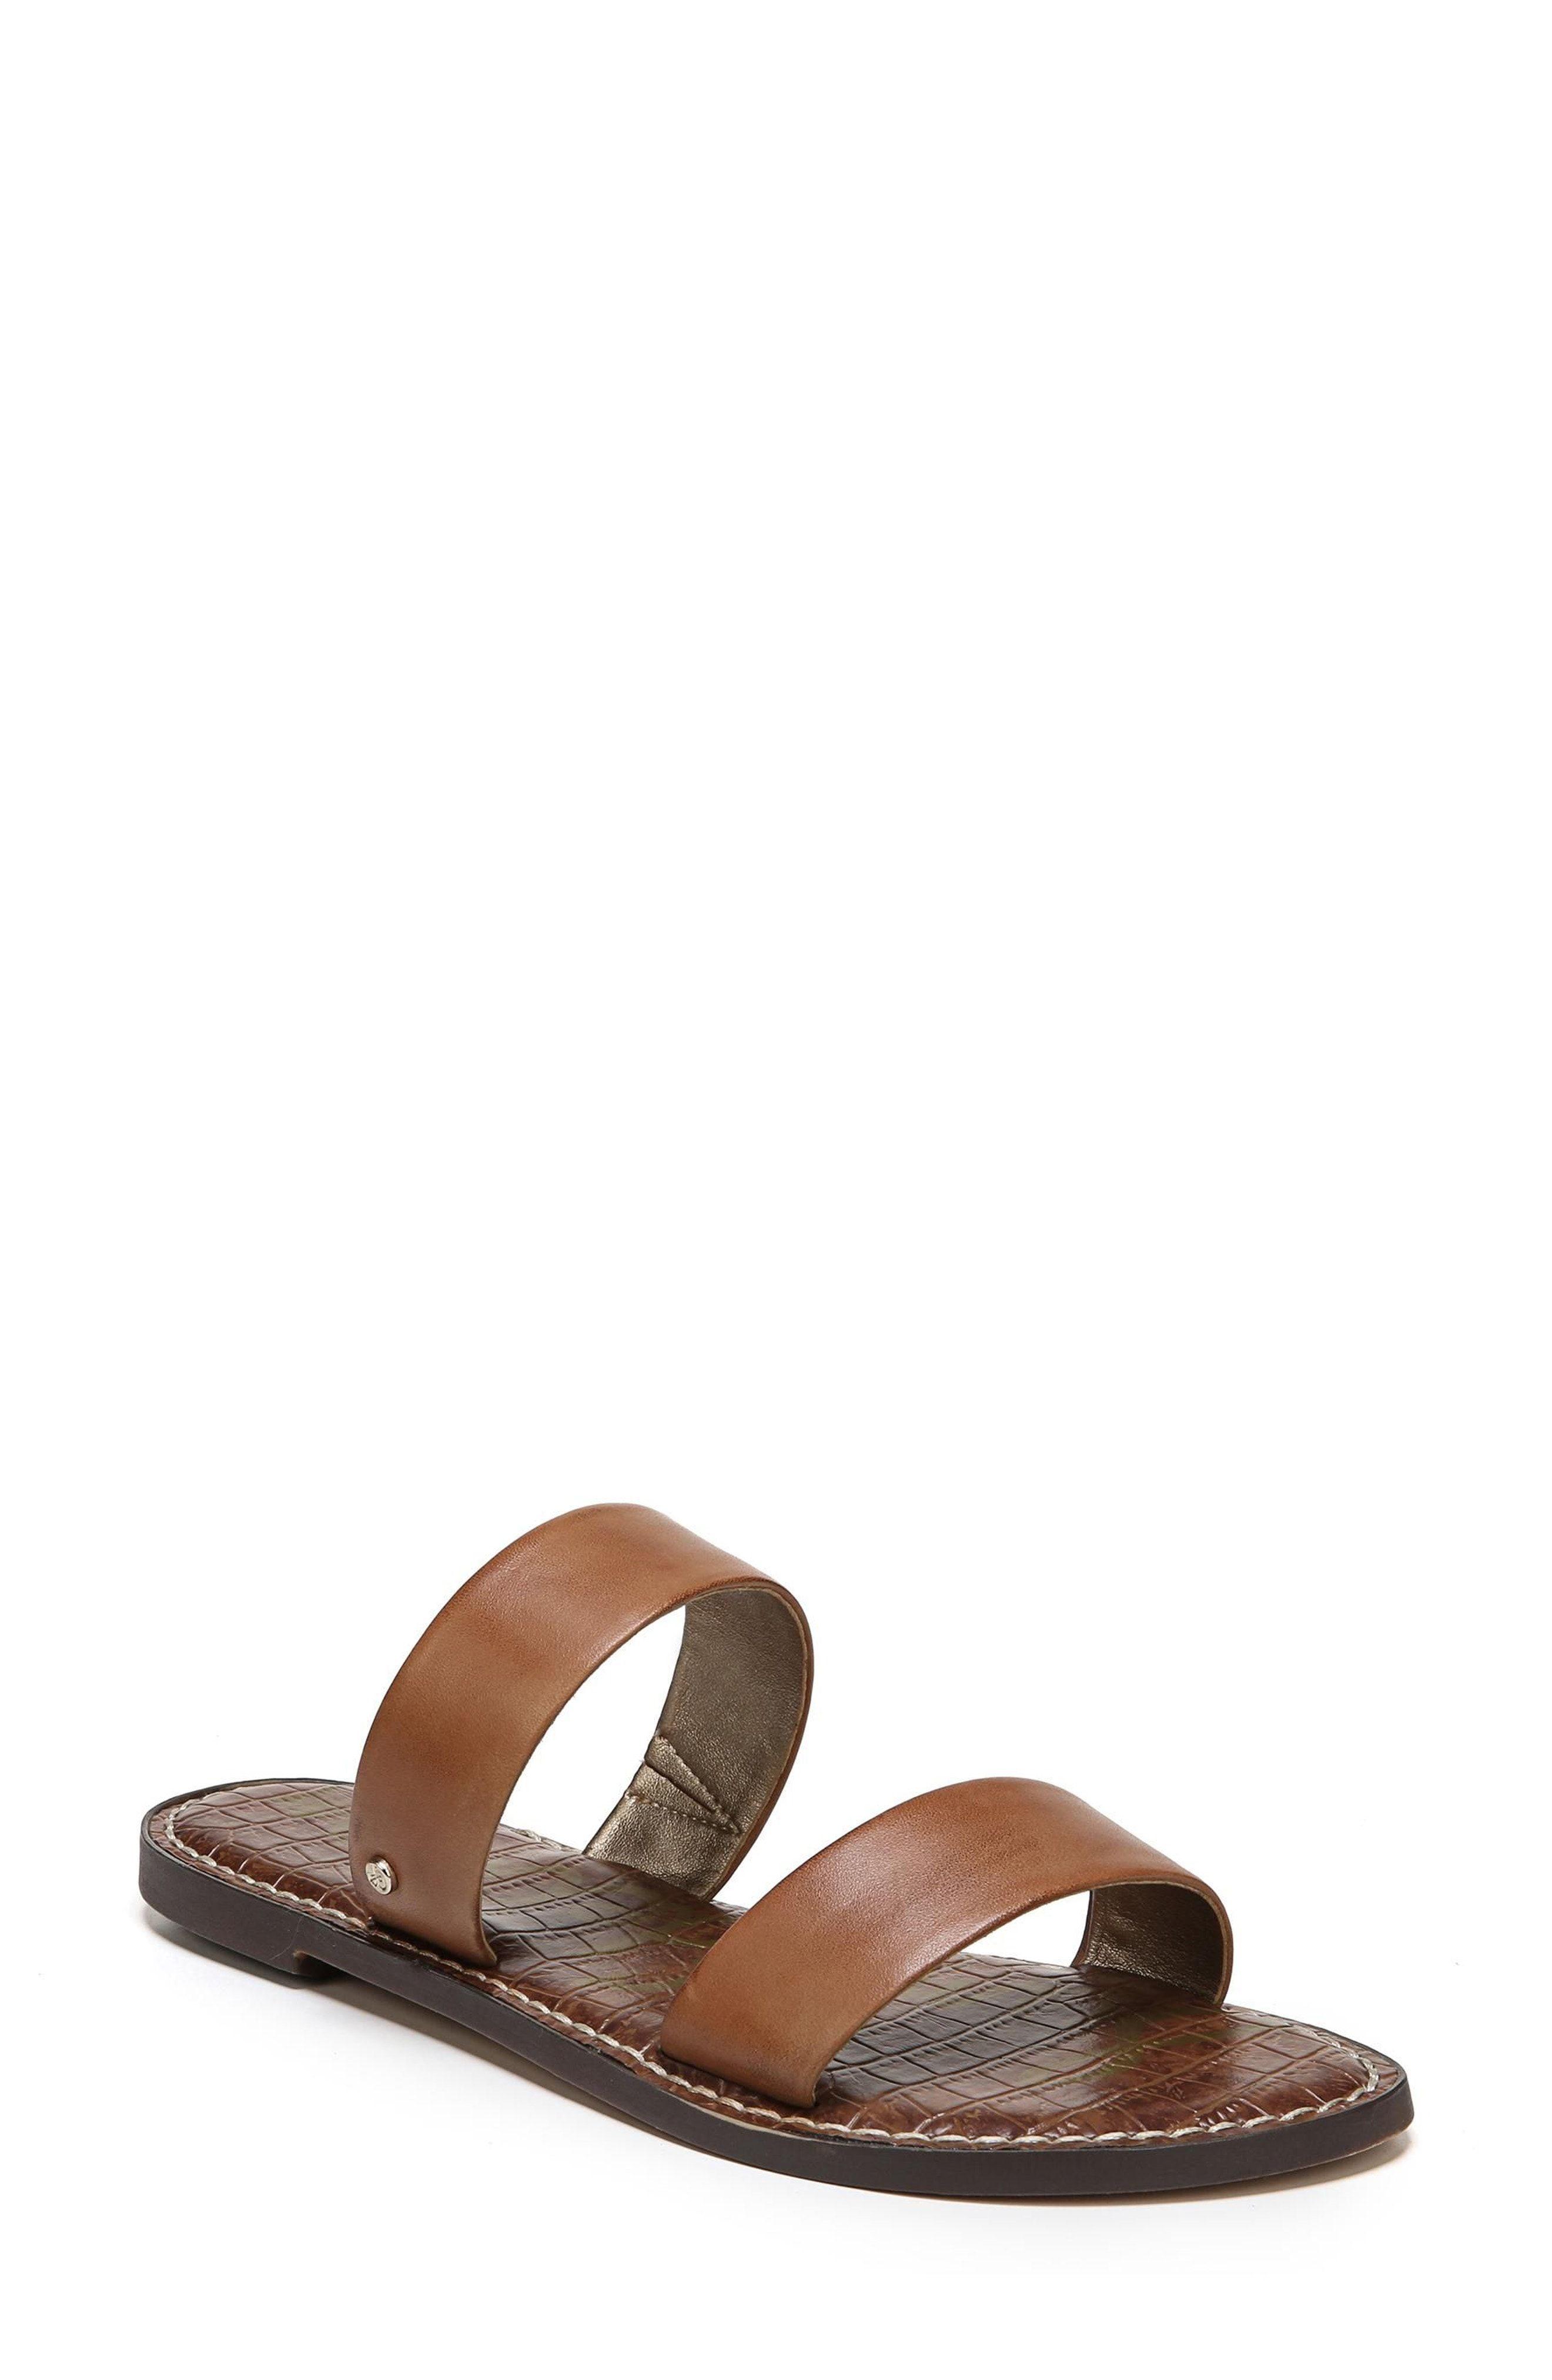 602ecea82 sam edelman gala leather two strap slide sandal